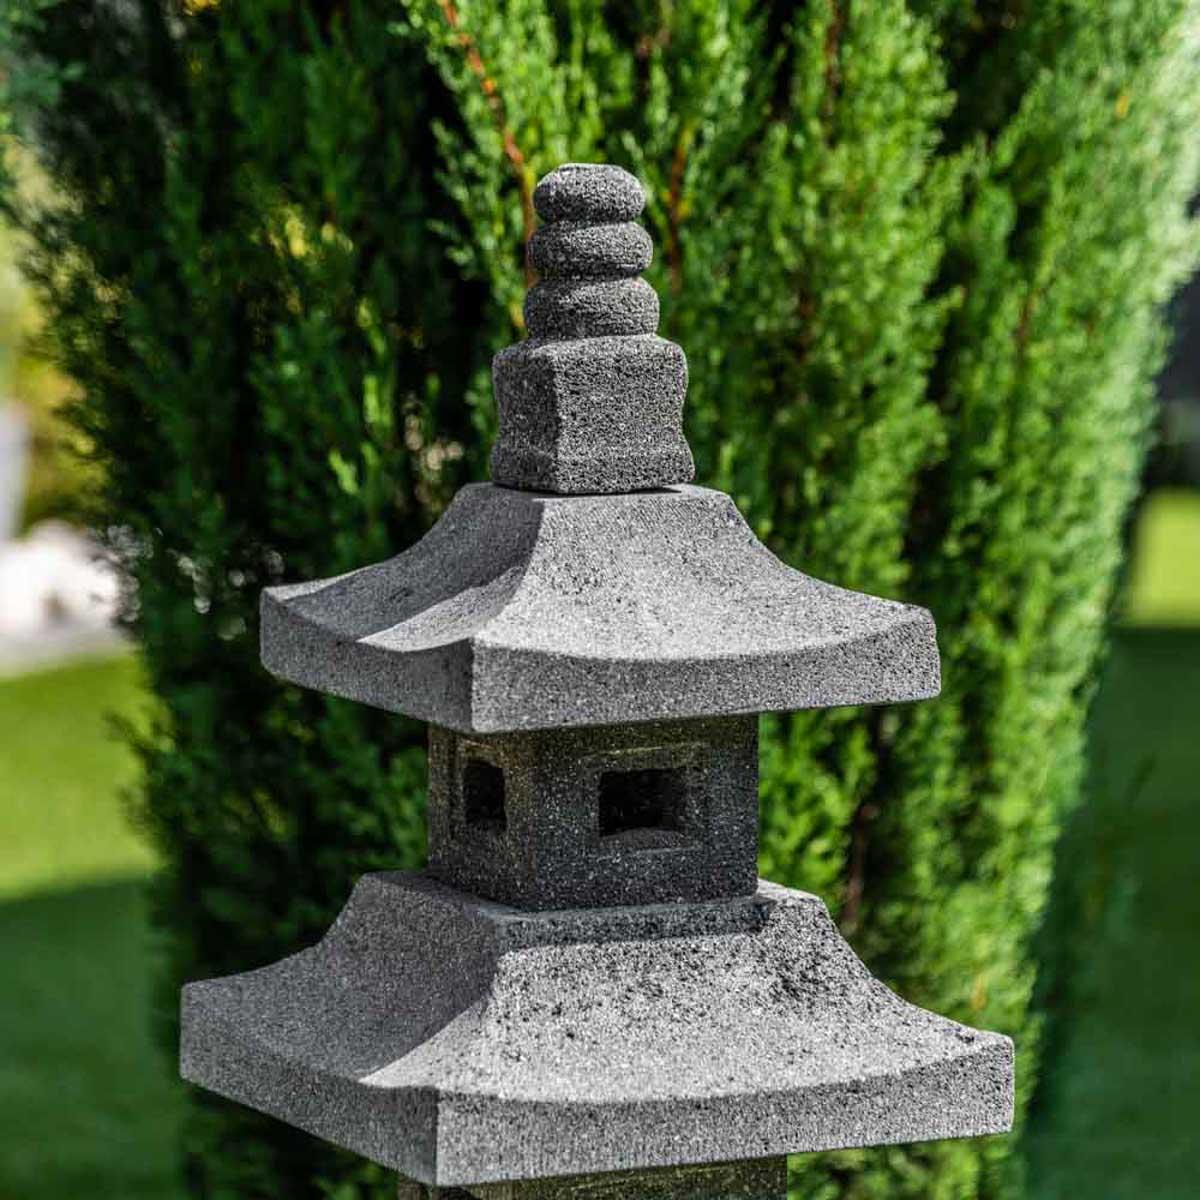 lampe de jardin en pierre de lave naturel h 80 cm. Black Bedroom Furniture Sets. Home Design Ideas